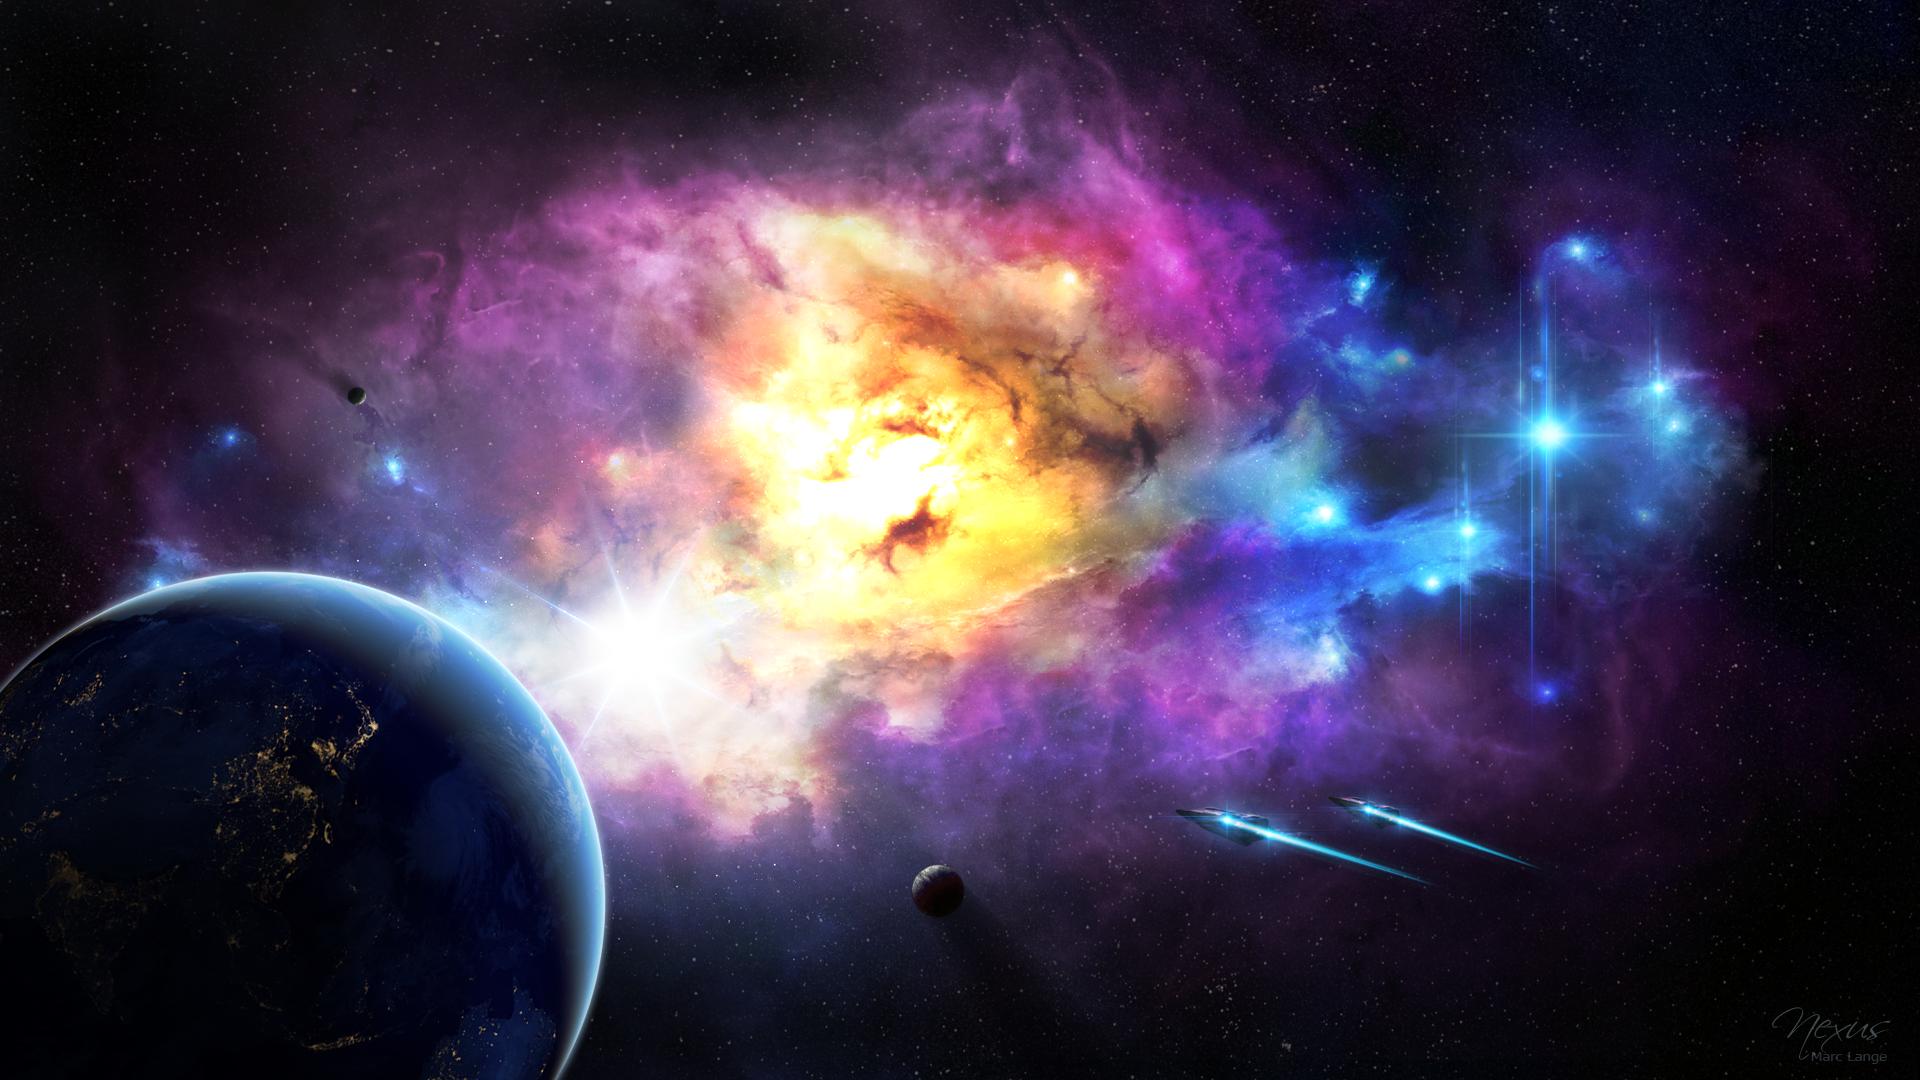 Sci Fi - Nebula  Stars Planet Earth Spaceship Sci Fi Science Space Wallpaper